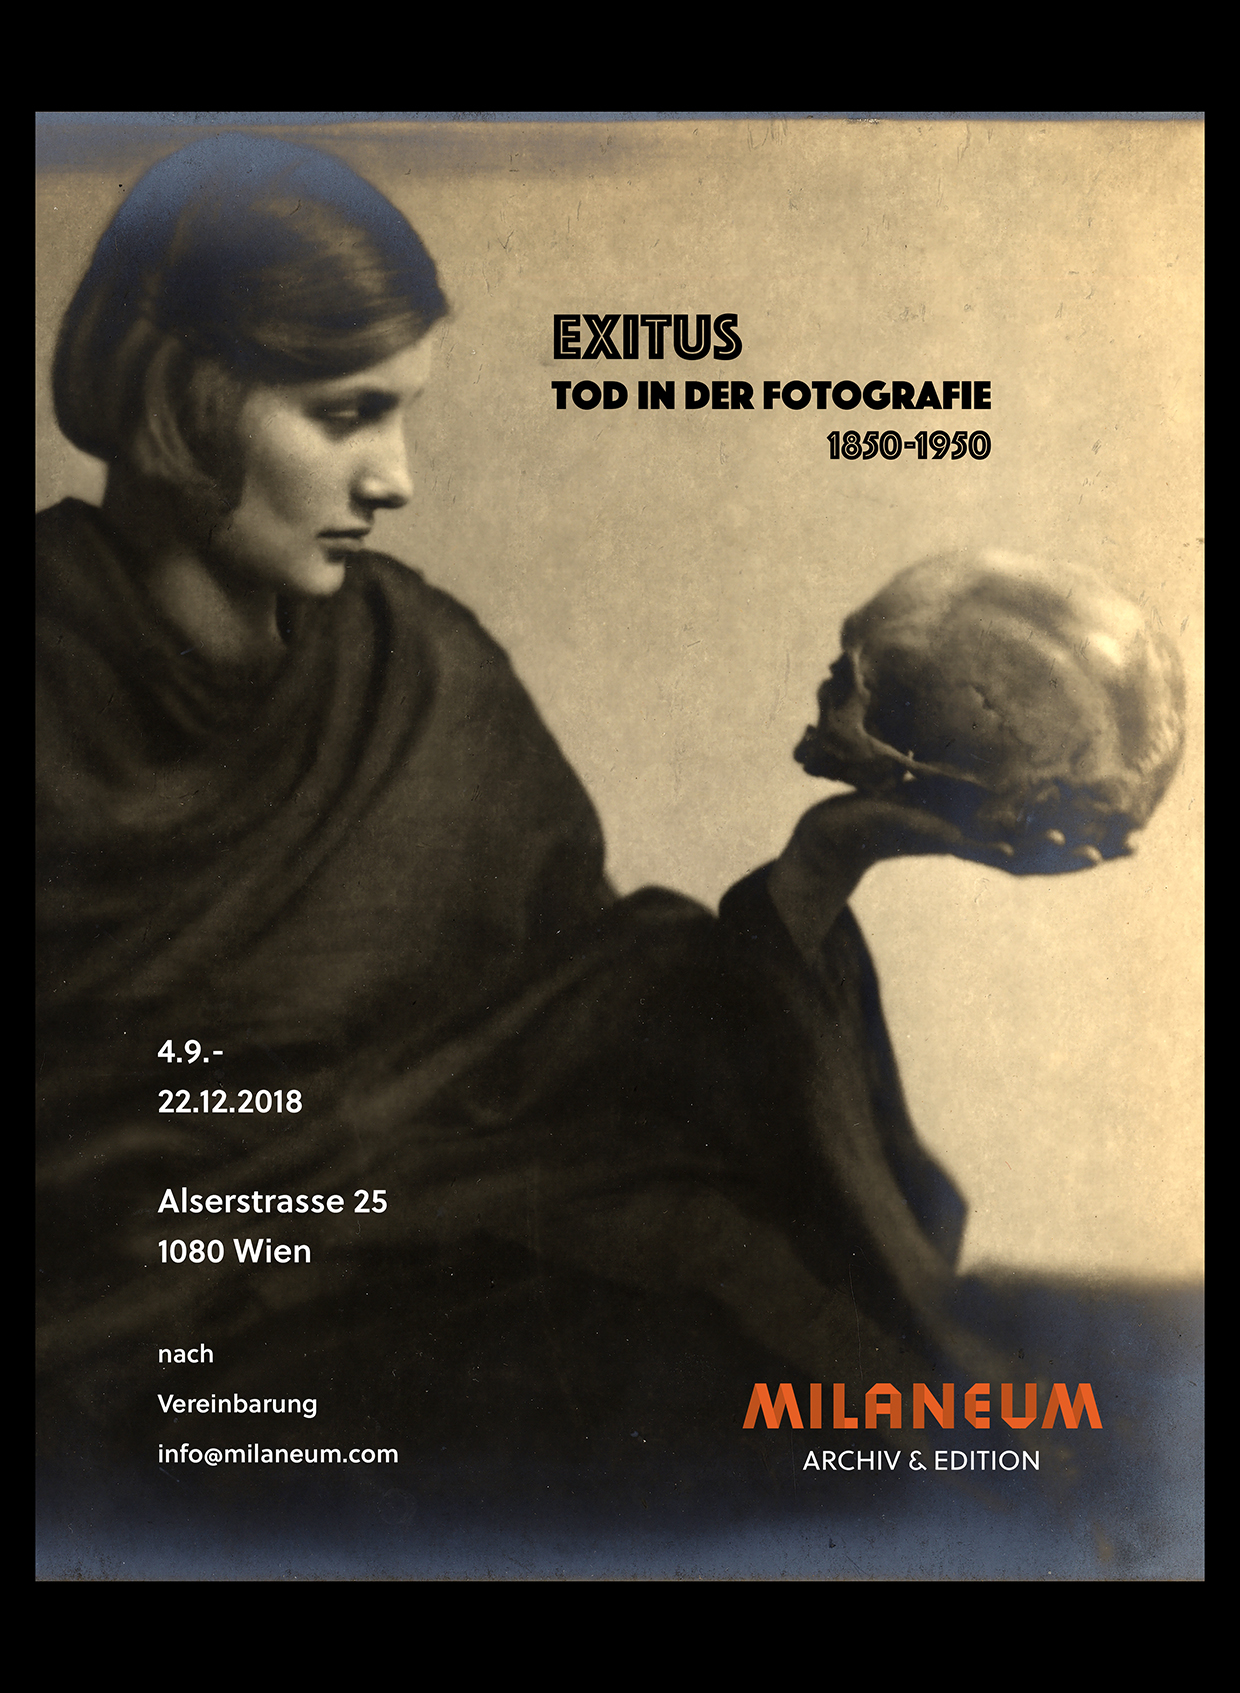 EXITUS-Plakat kl